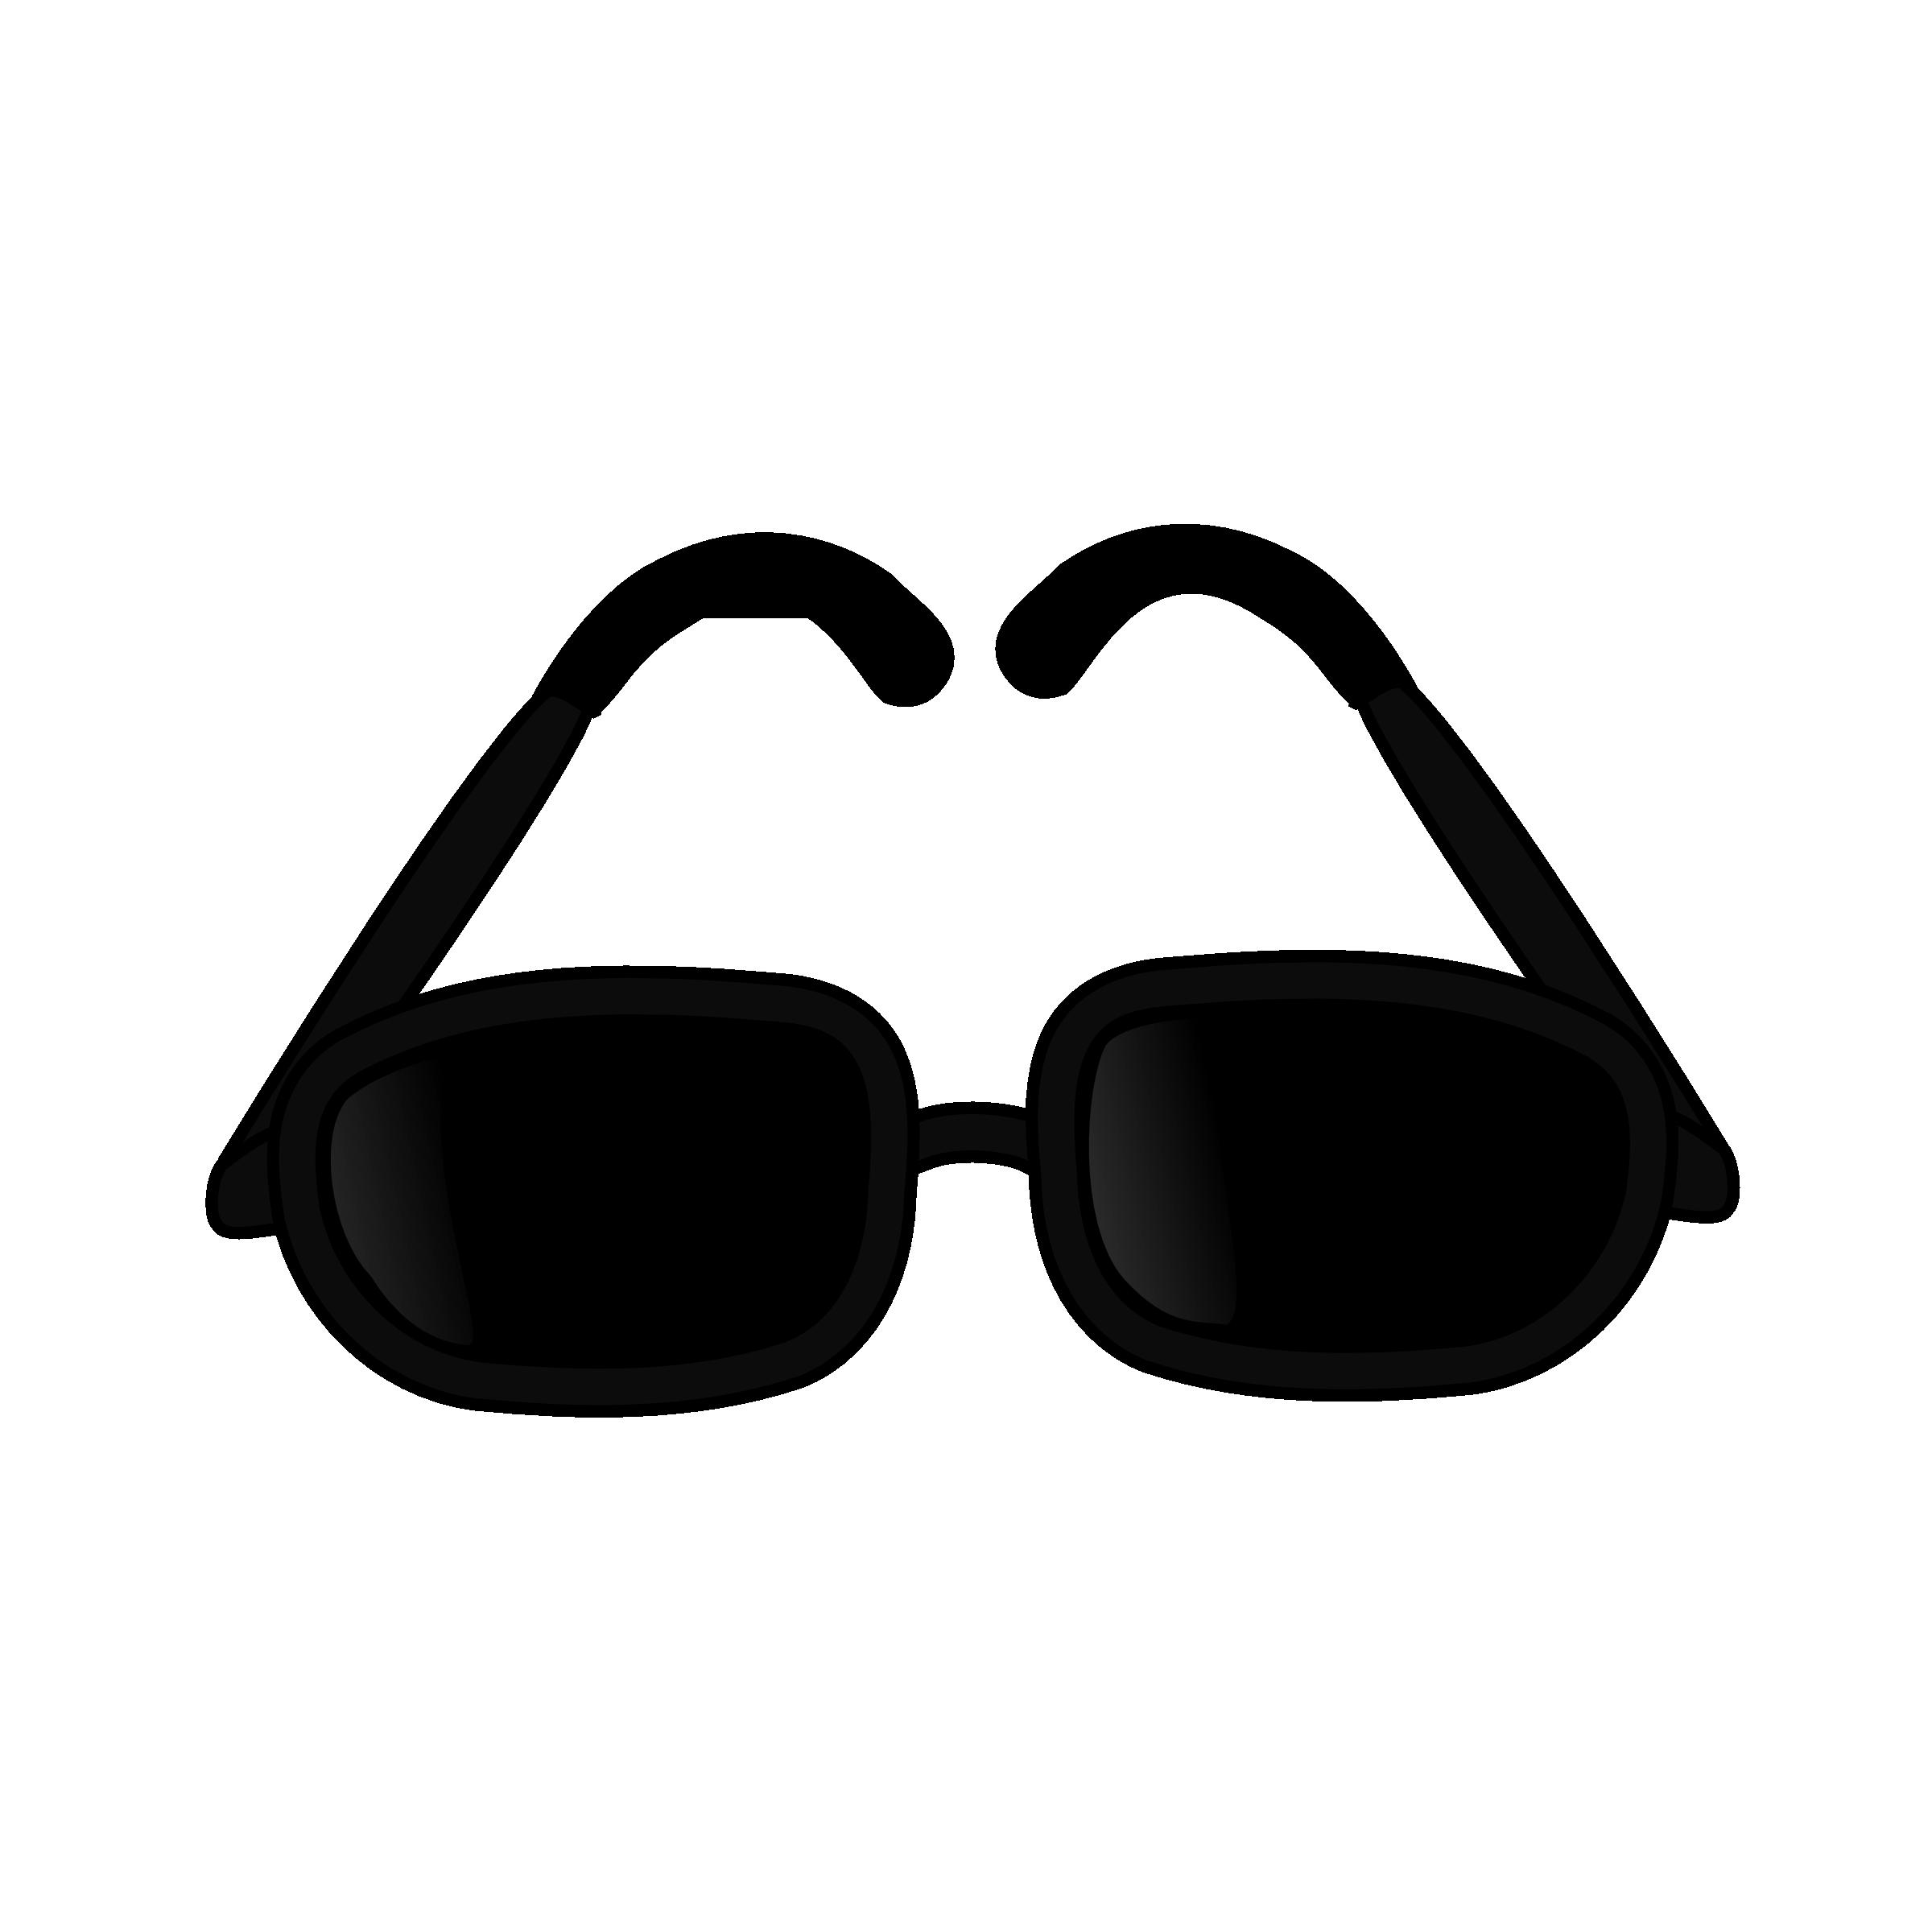 Sunglasses clipart printable. Eyeglasses panda free images